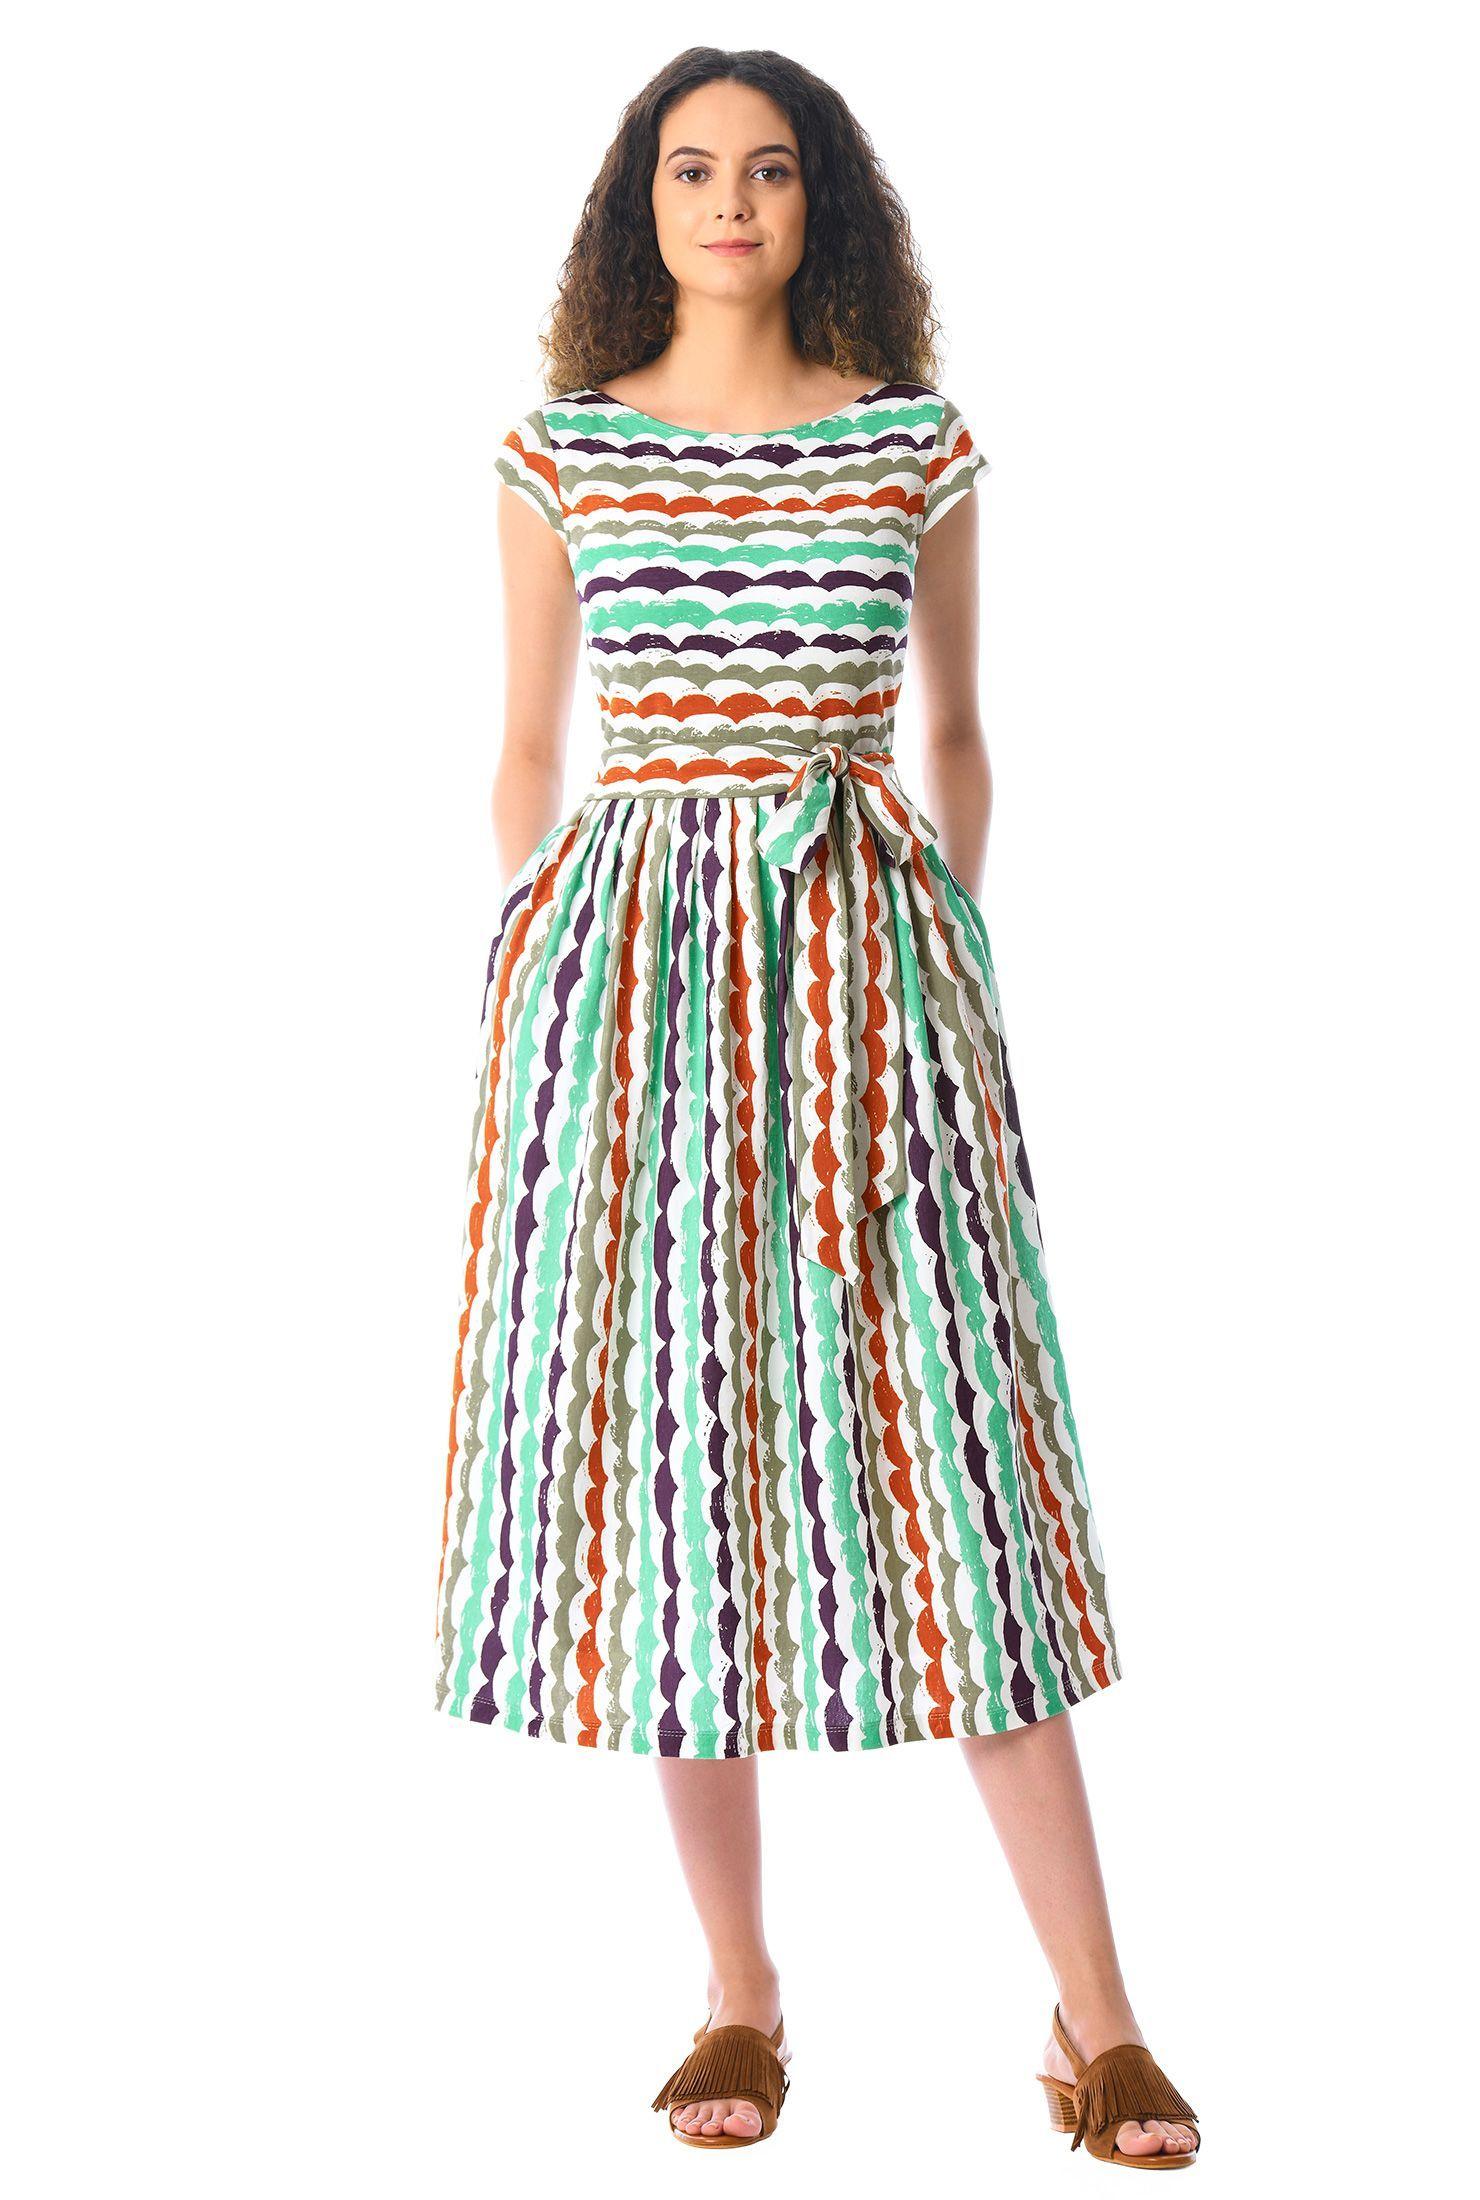 392b78cf61d4e Womens Sundresses